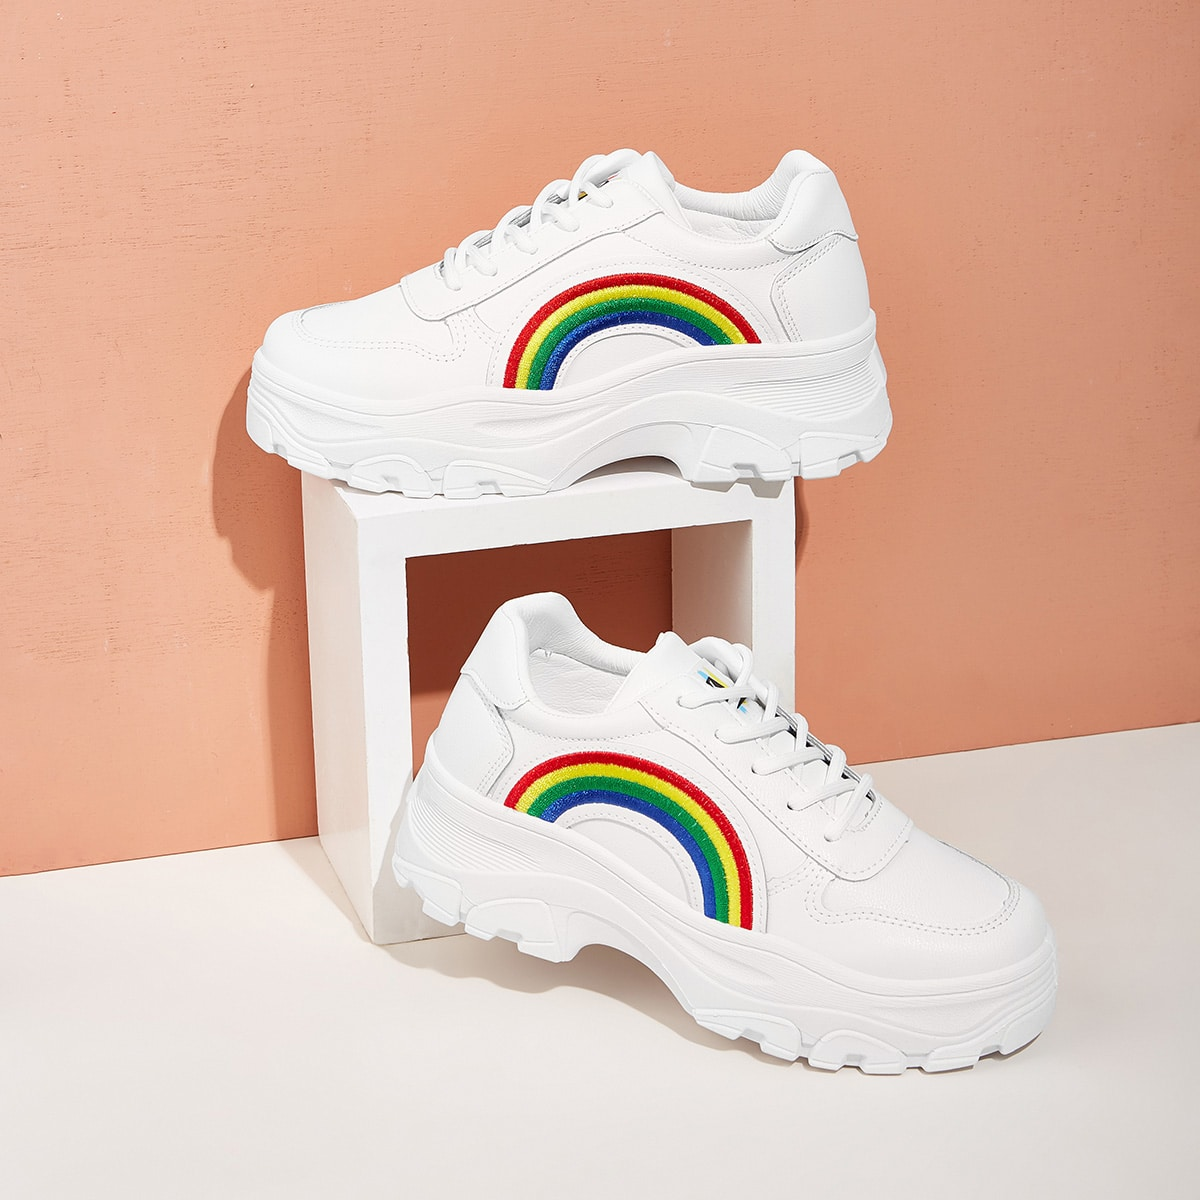 Кроссовки на платформе с вышивкой радуги от SHEIN